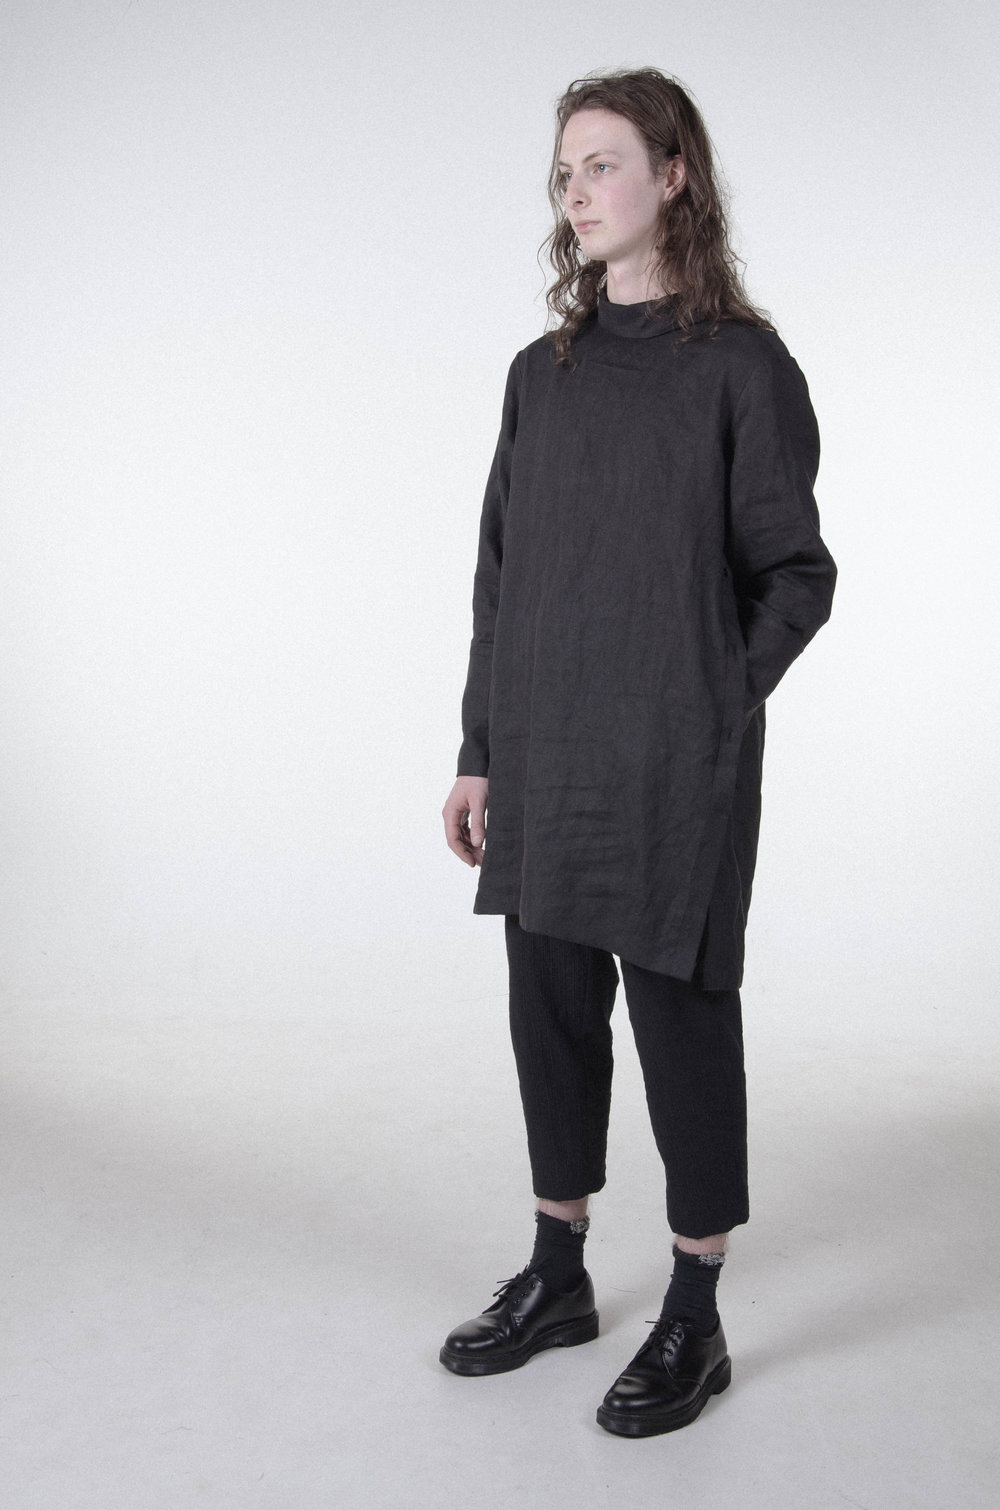 britt-pooley-agoraphobia-collective-sideways-collar-identity-shirt